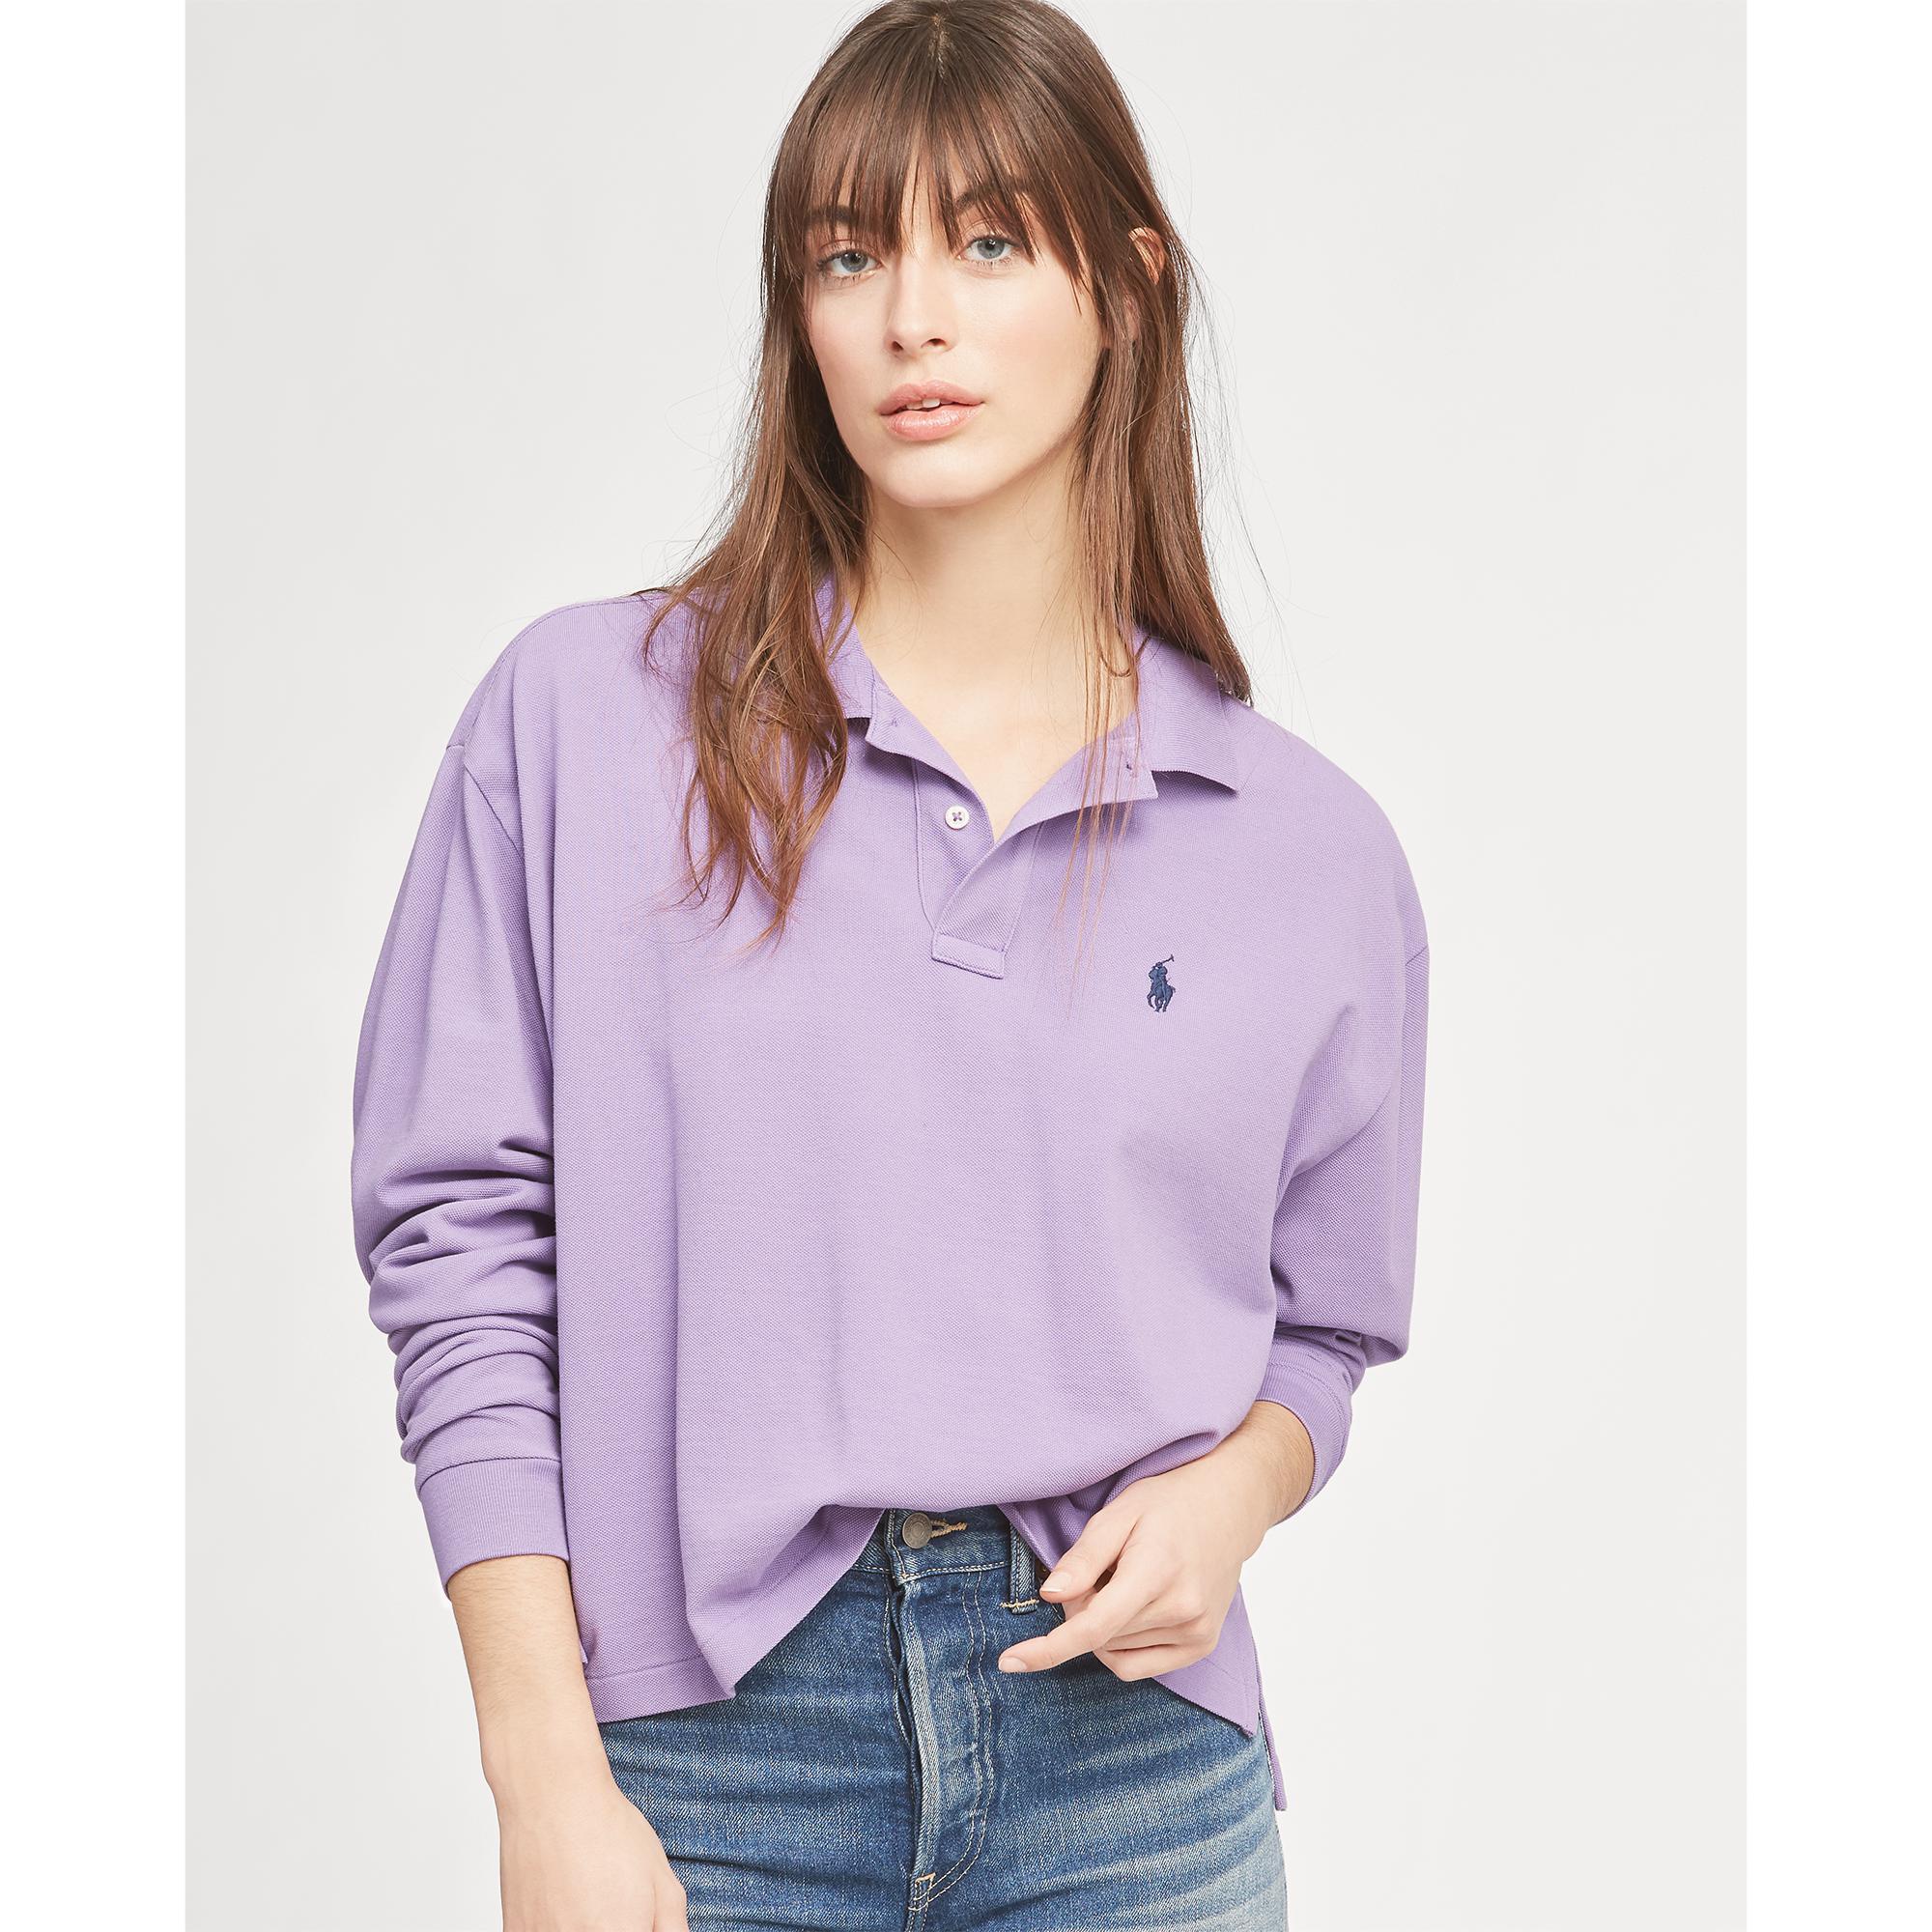 4357e60108f02 Lyst - Polo Ralph Lauren Cropped Mesh Polo Shirt in Purple